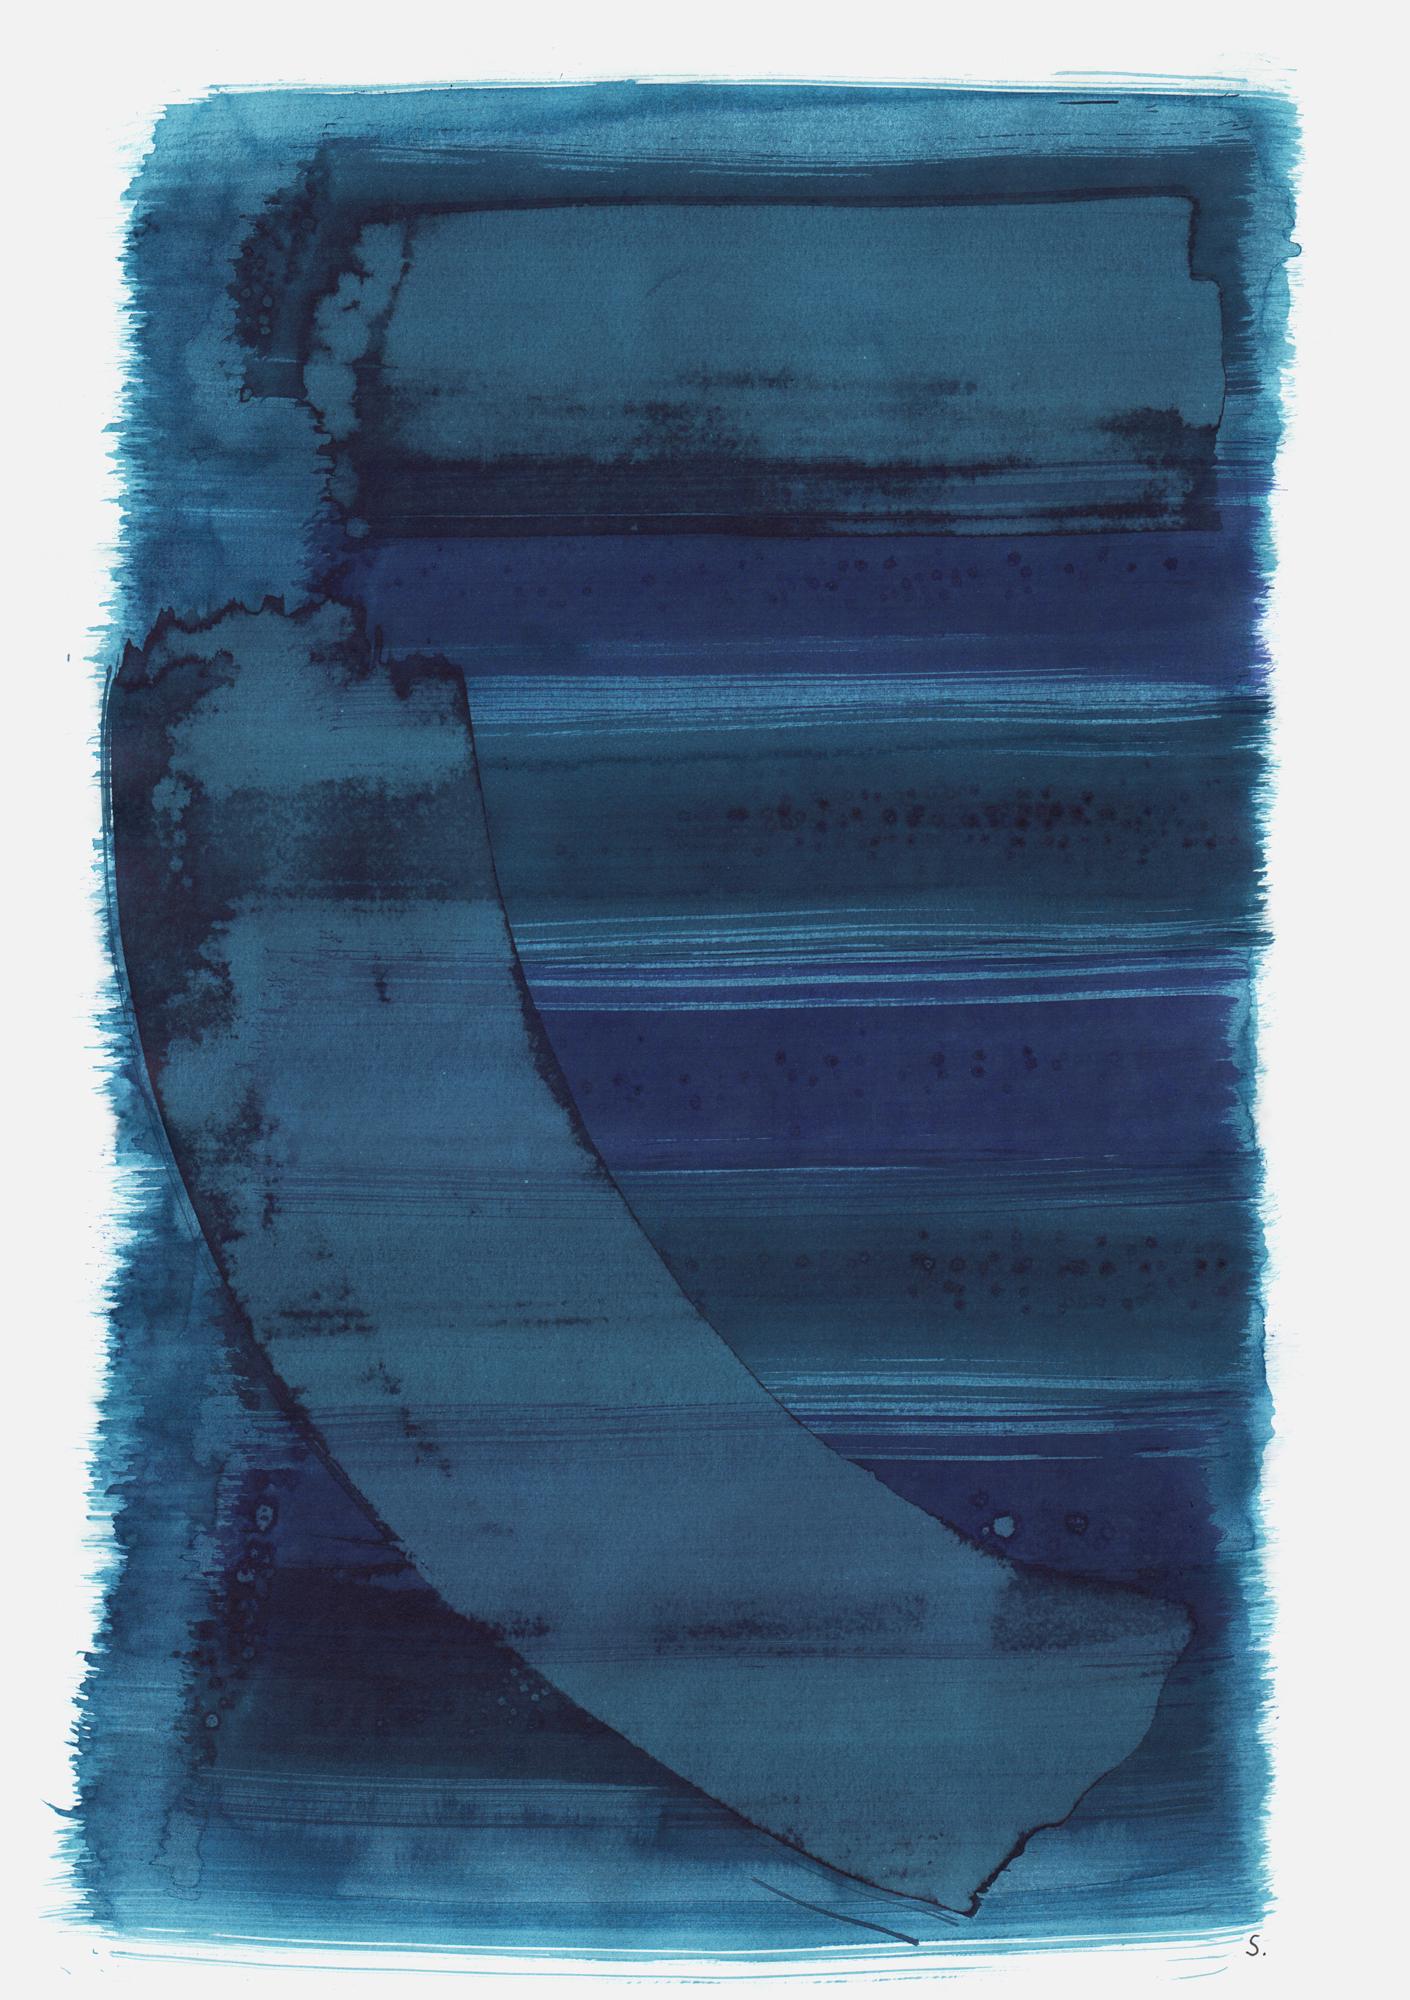 """An Hanni Magier"", 2019, Tusche auf Papier, 48 x 36cm; ©: Konstanze Sailer [Magier, Hanni; * 21.11.1931 in Berlin; deportiert aus Berlin; † 15.05.1942 in Kulmhof/Chelmno]"